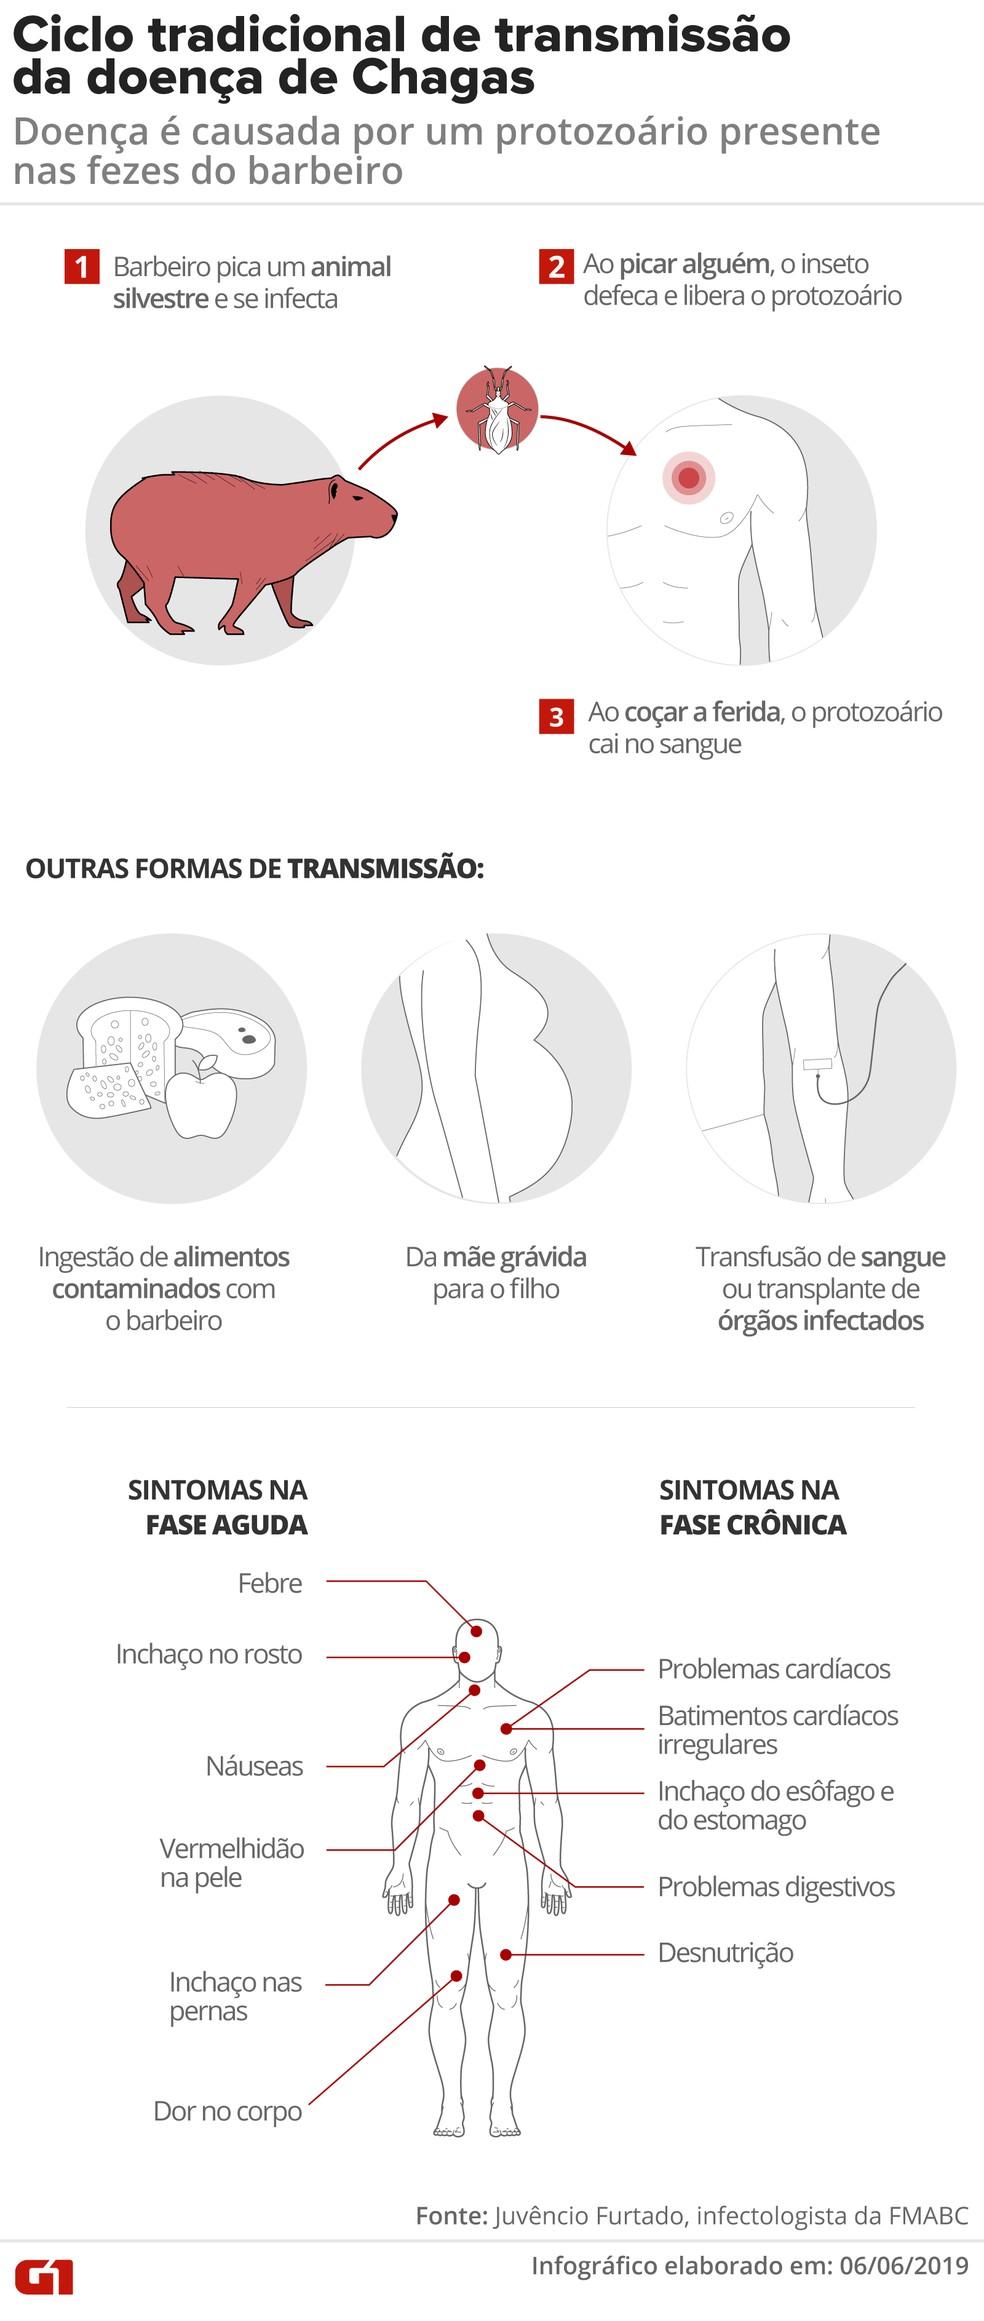 Entenda como a doença de Chagas pode ser transmitida — Foto: Diana Yukari e Juliane Monteiro/G1